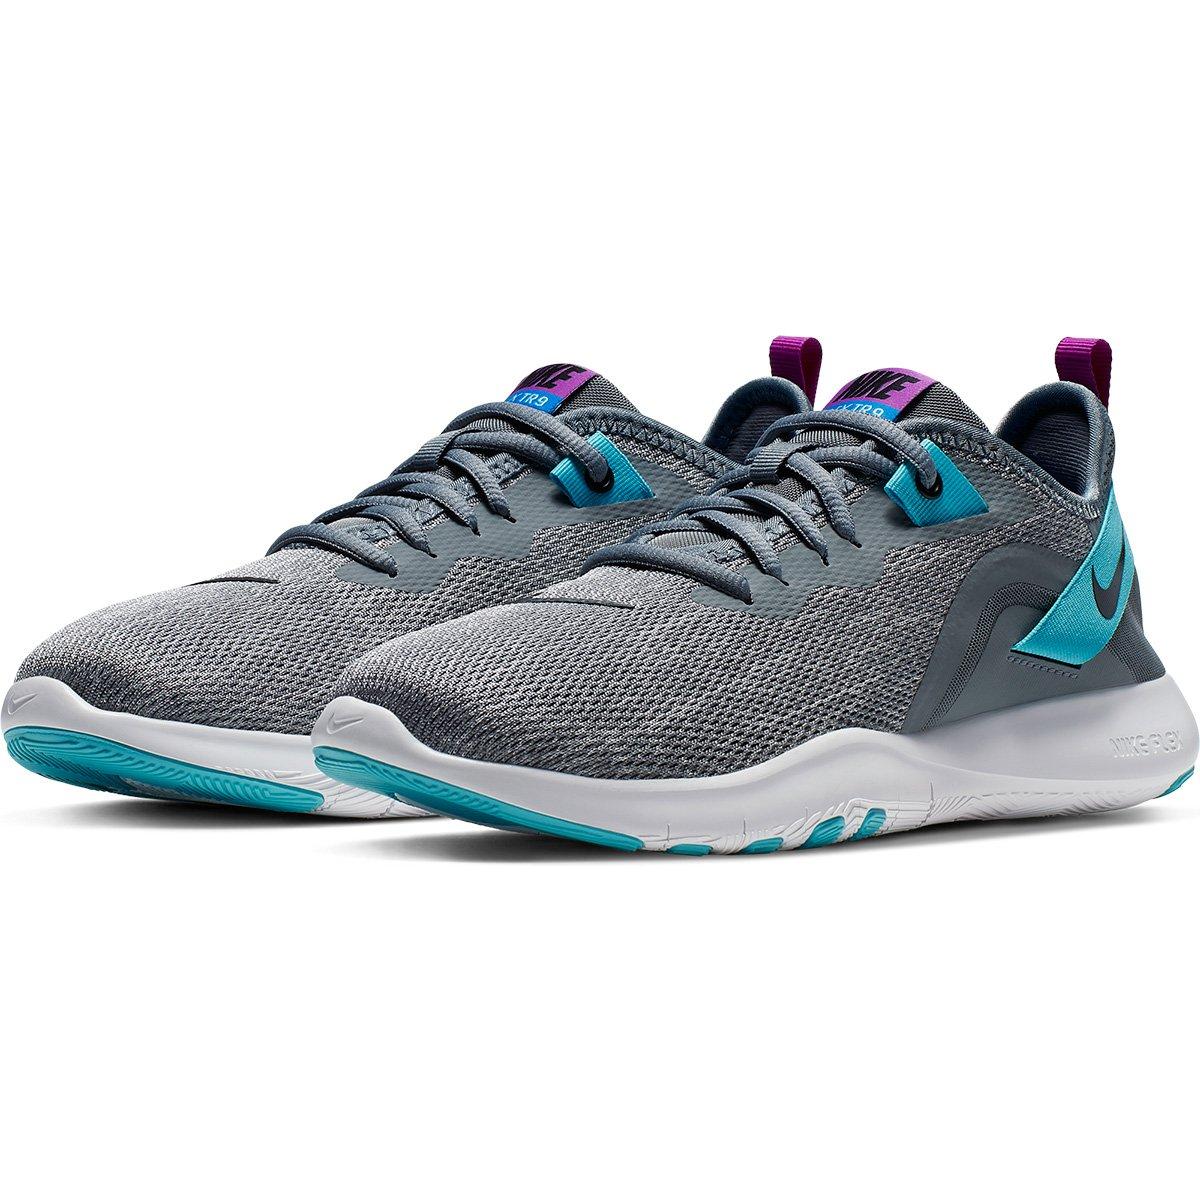 5840c01a2b Tênis Nike Downshifter 9 Feminino